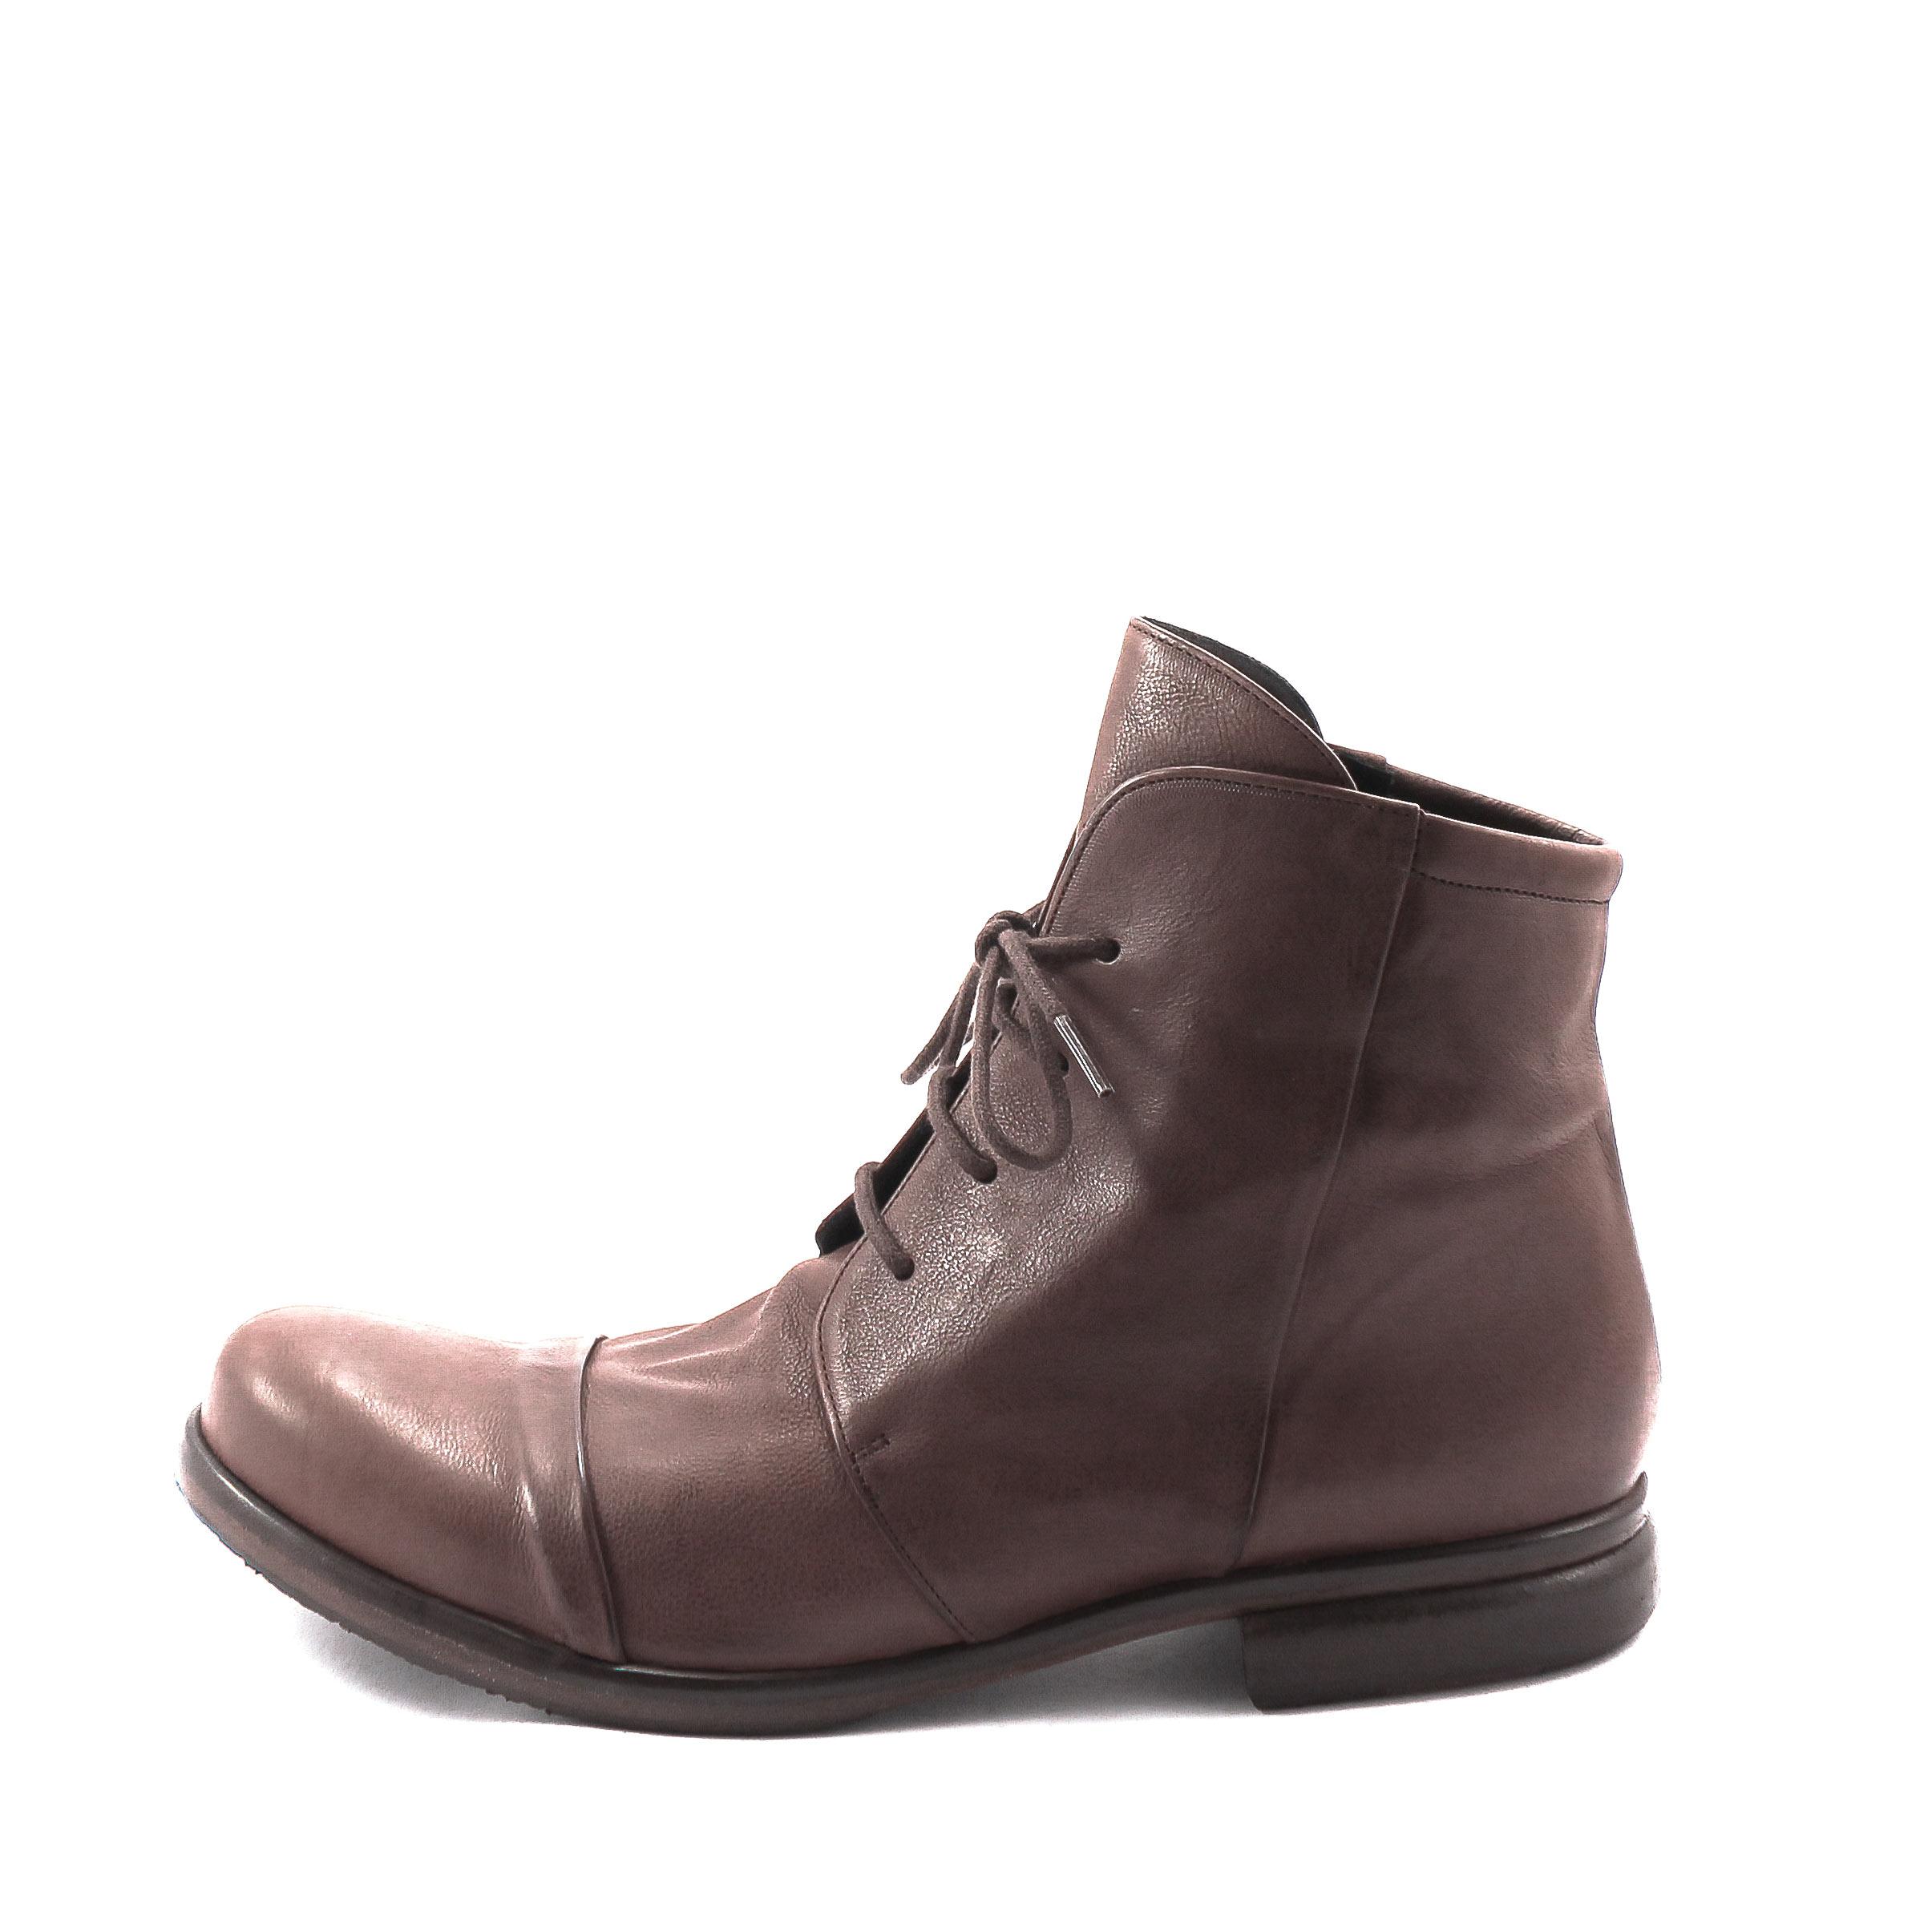 P. Monjo, P-219 Bowie Men's Bootees, brown Größe 42,5